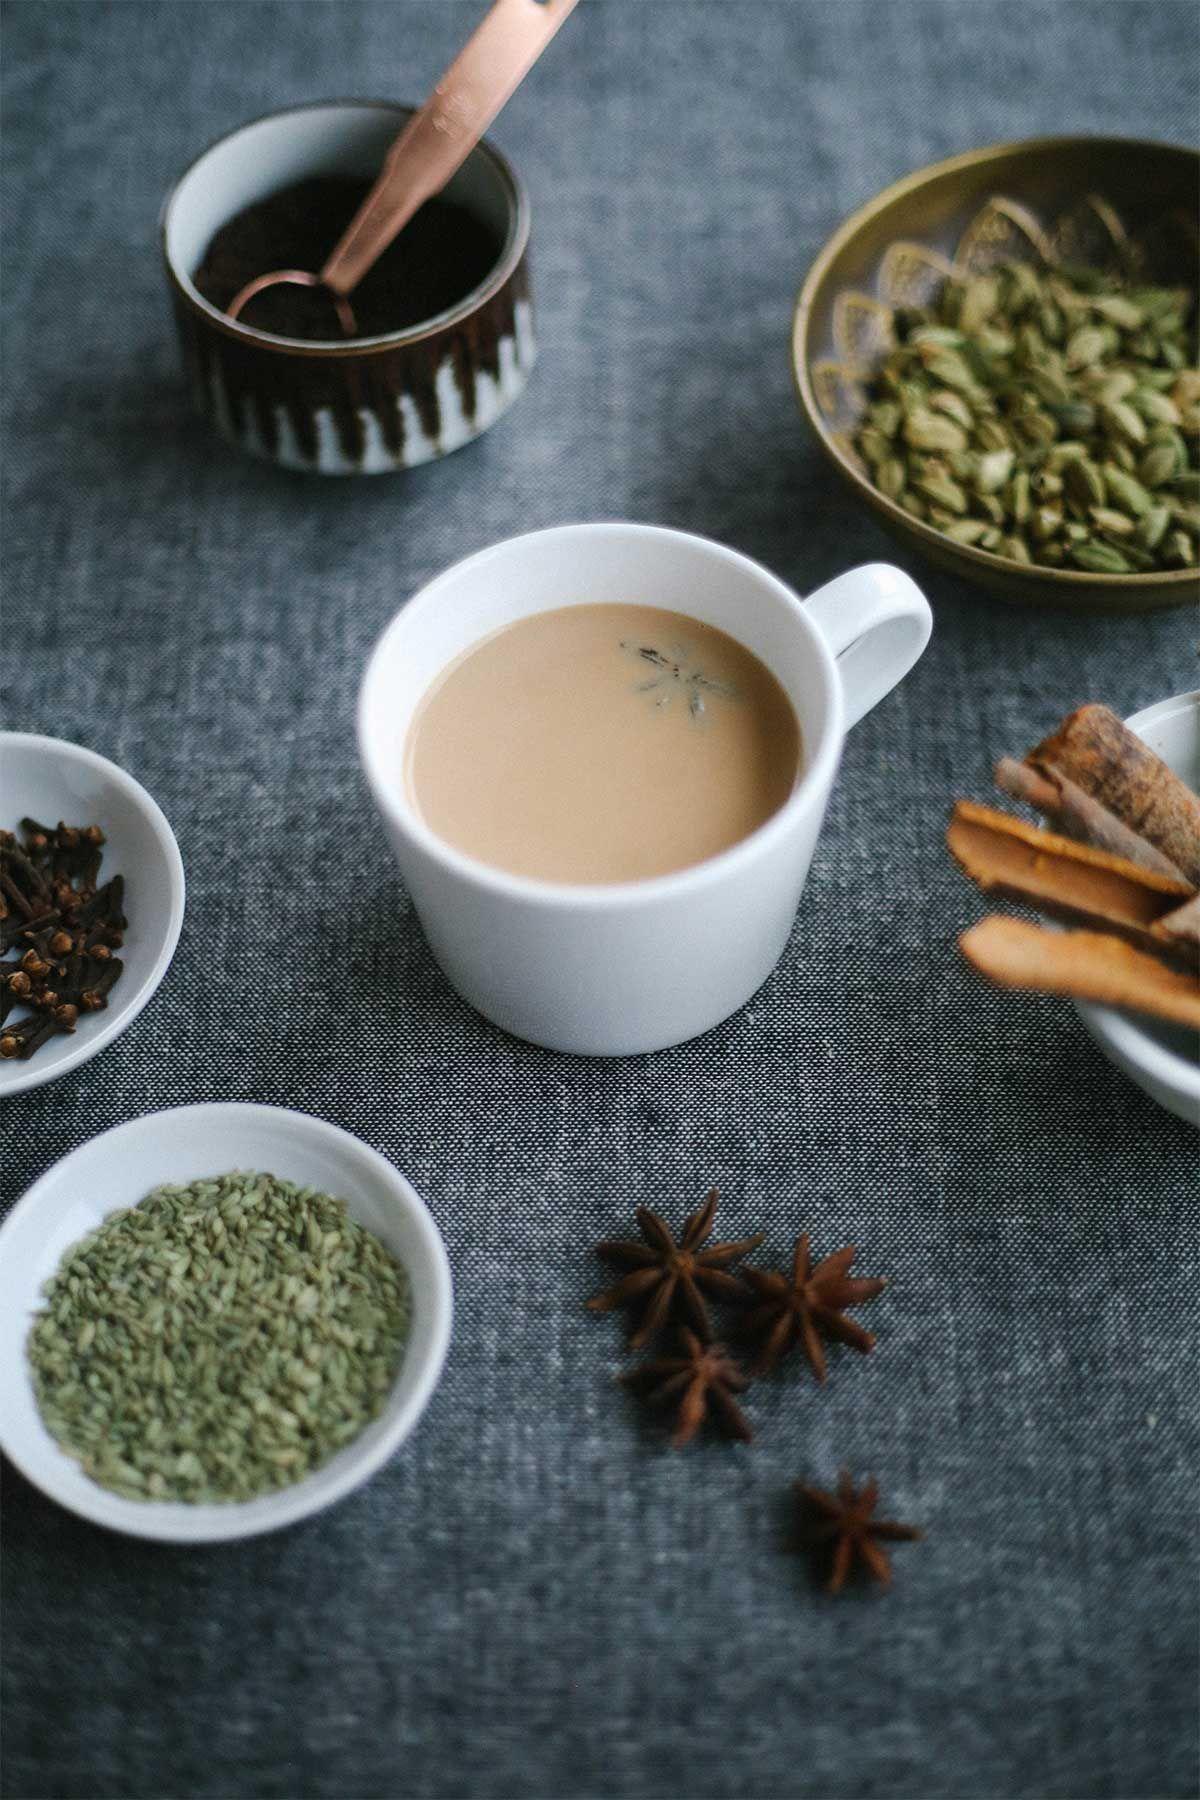 Keto Masala Chai Tea Recipe (With images) Masala chai